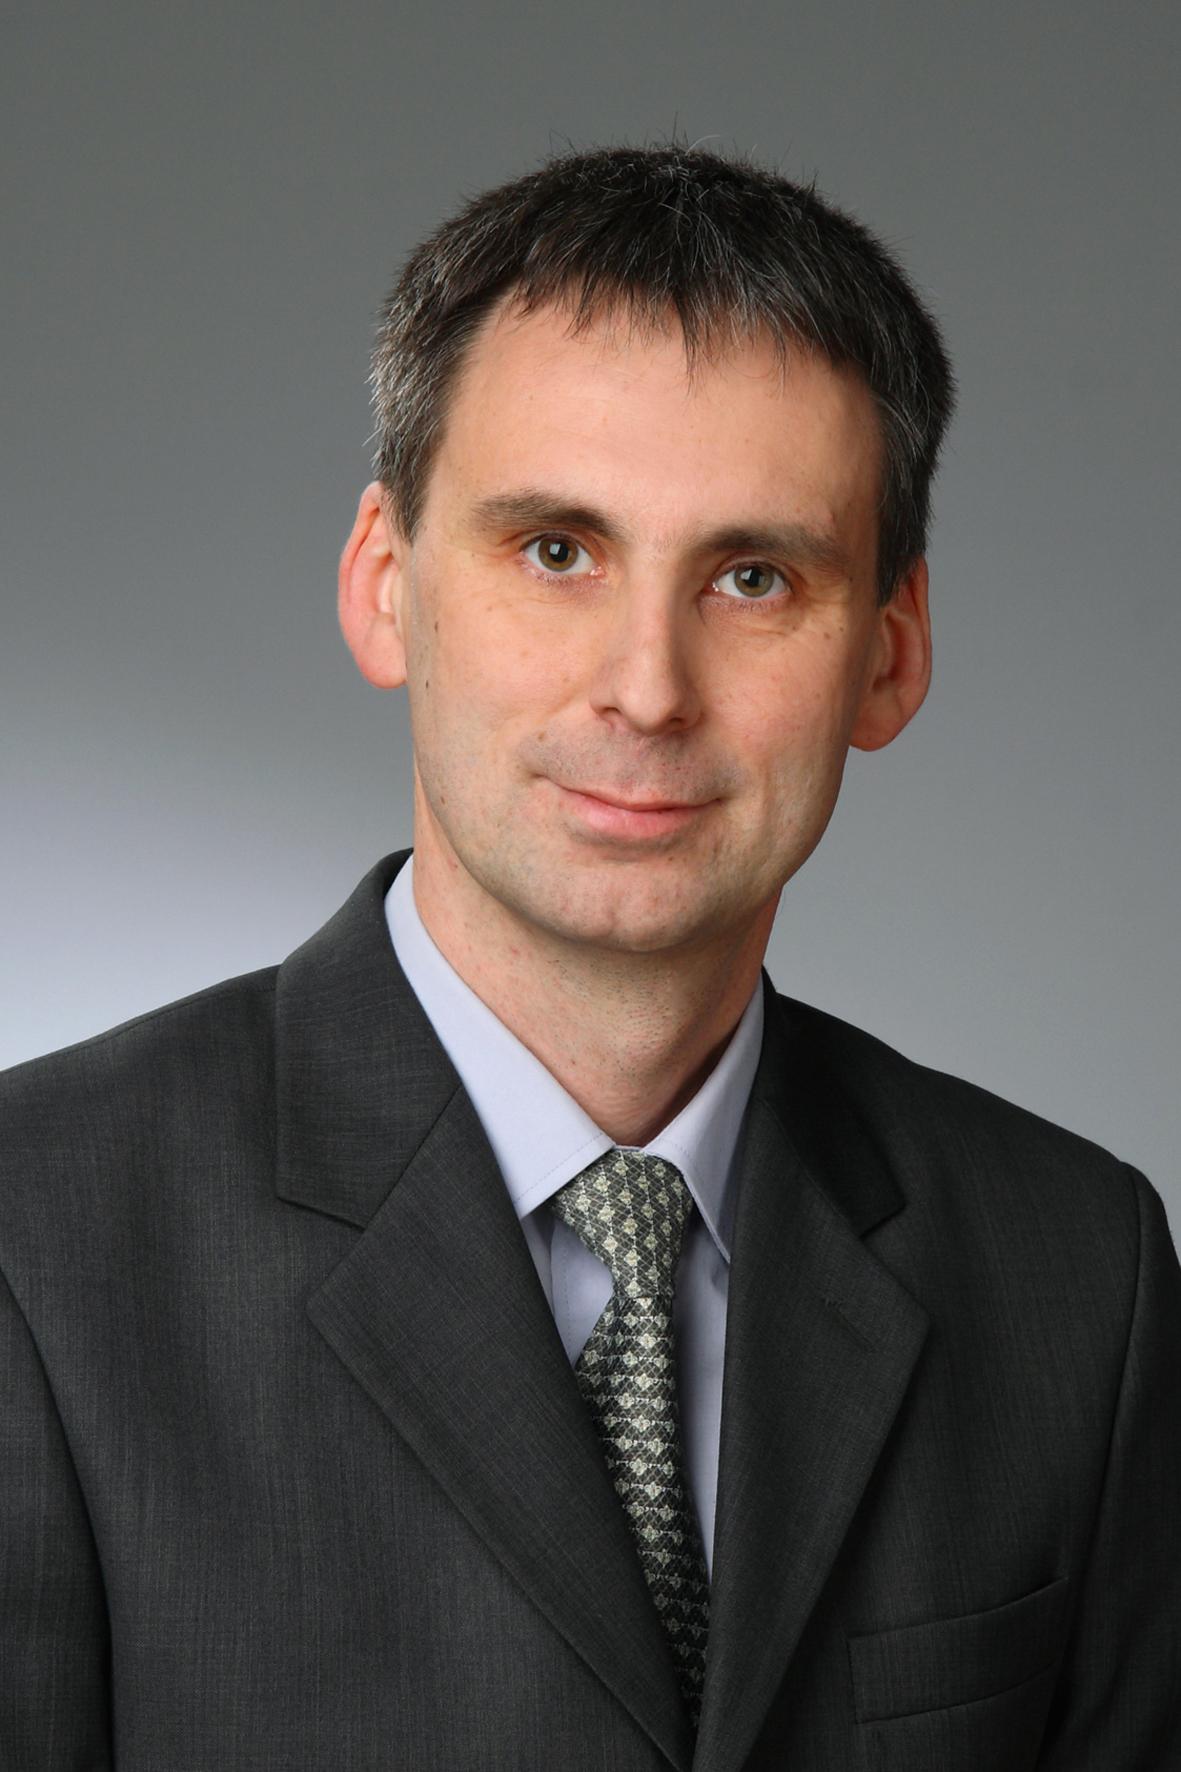 Wojciech Michałek